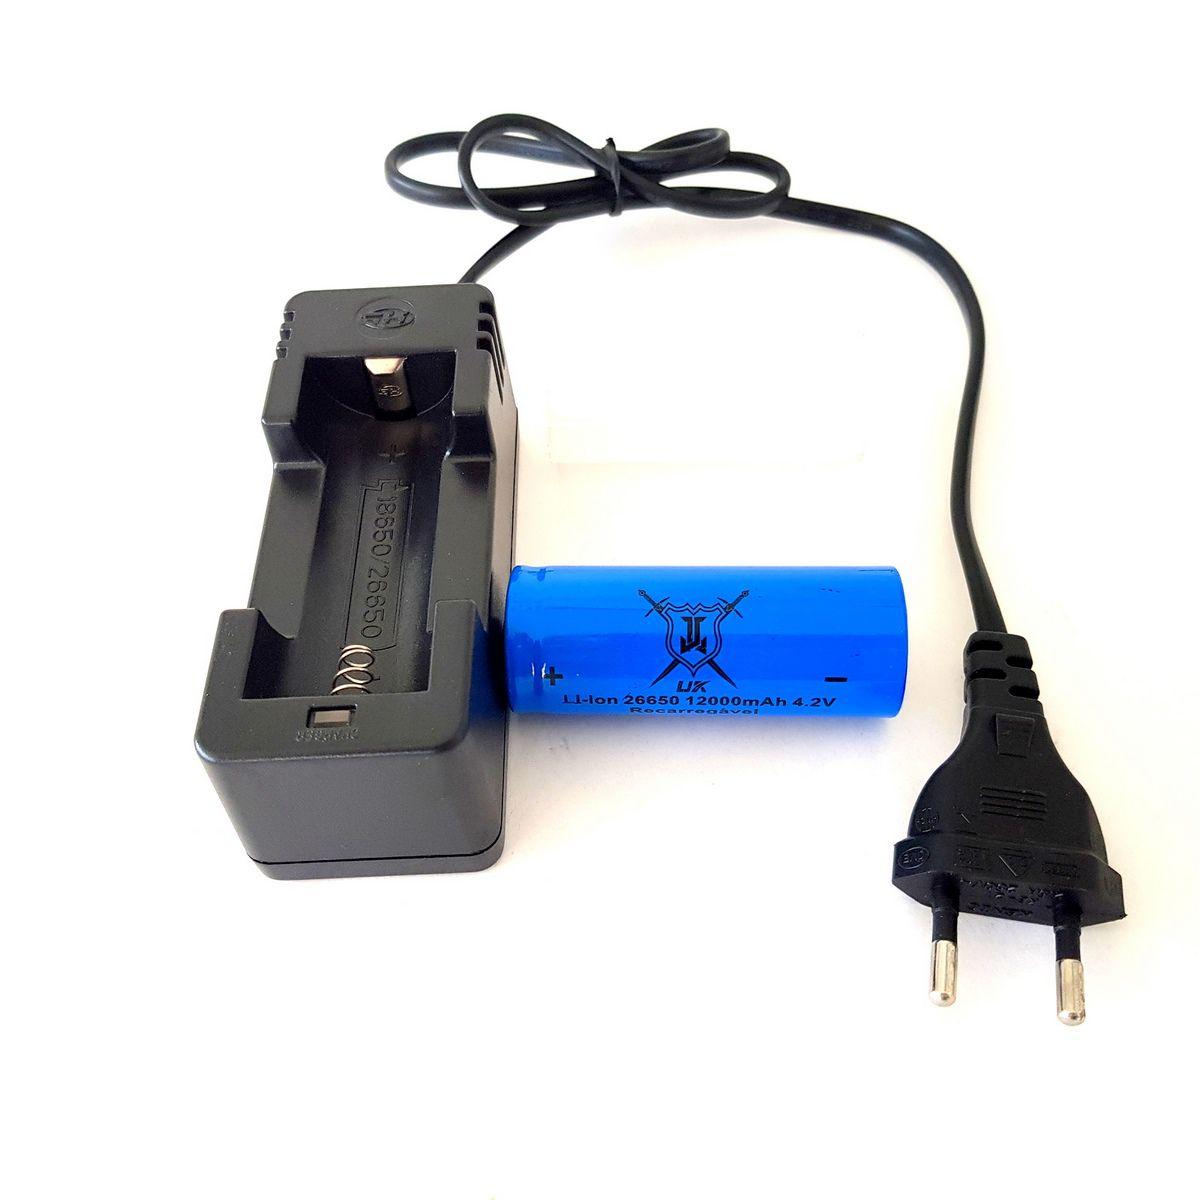 Lanterna Tática Ultra Potente Led Cree L2 Recarregável